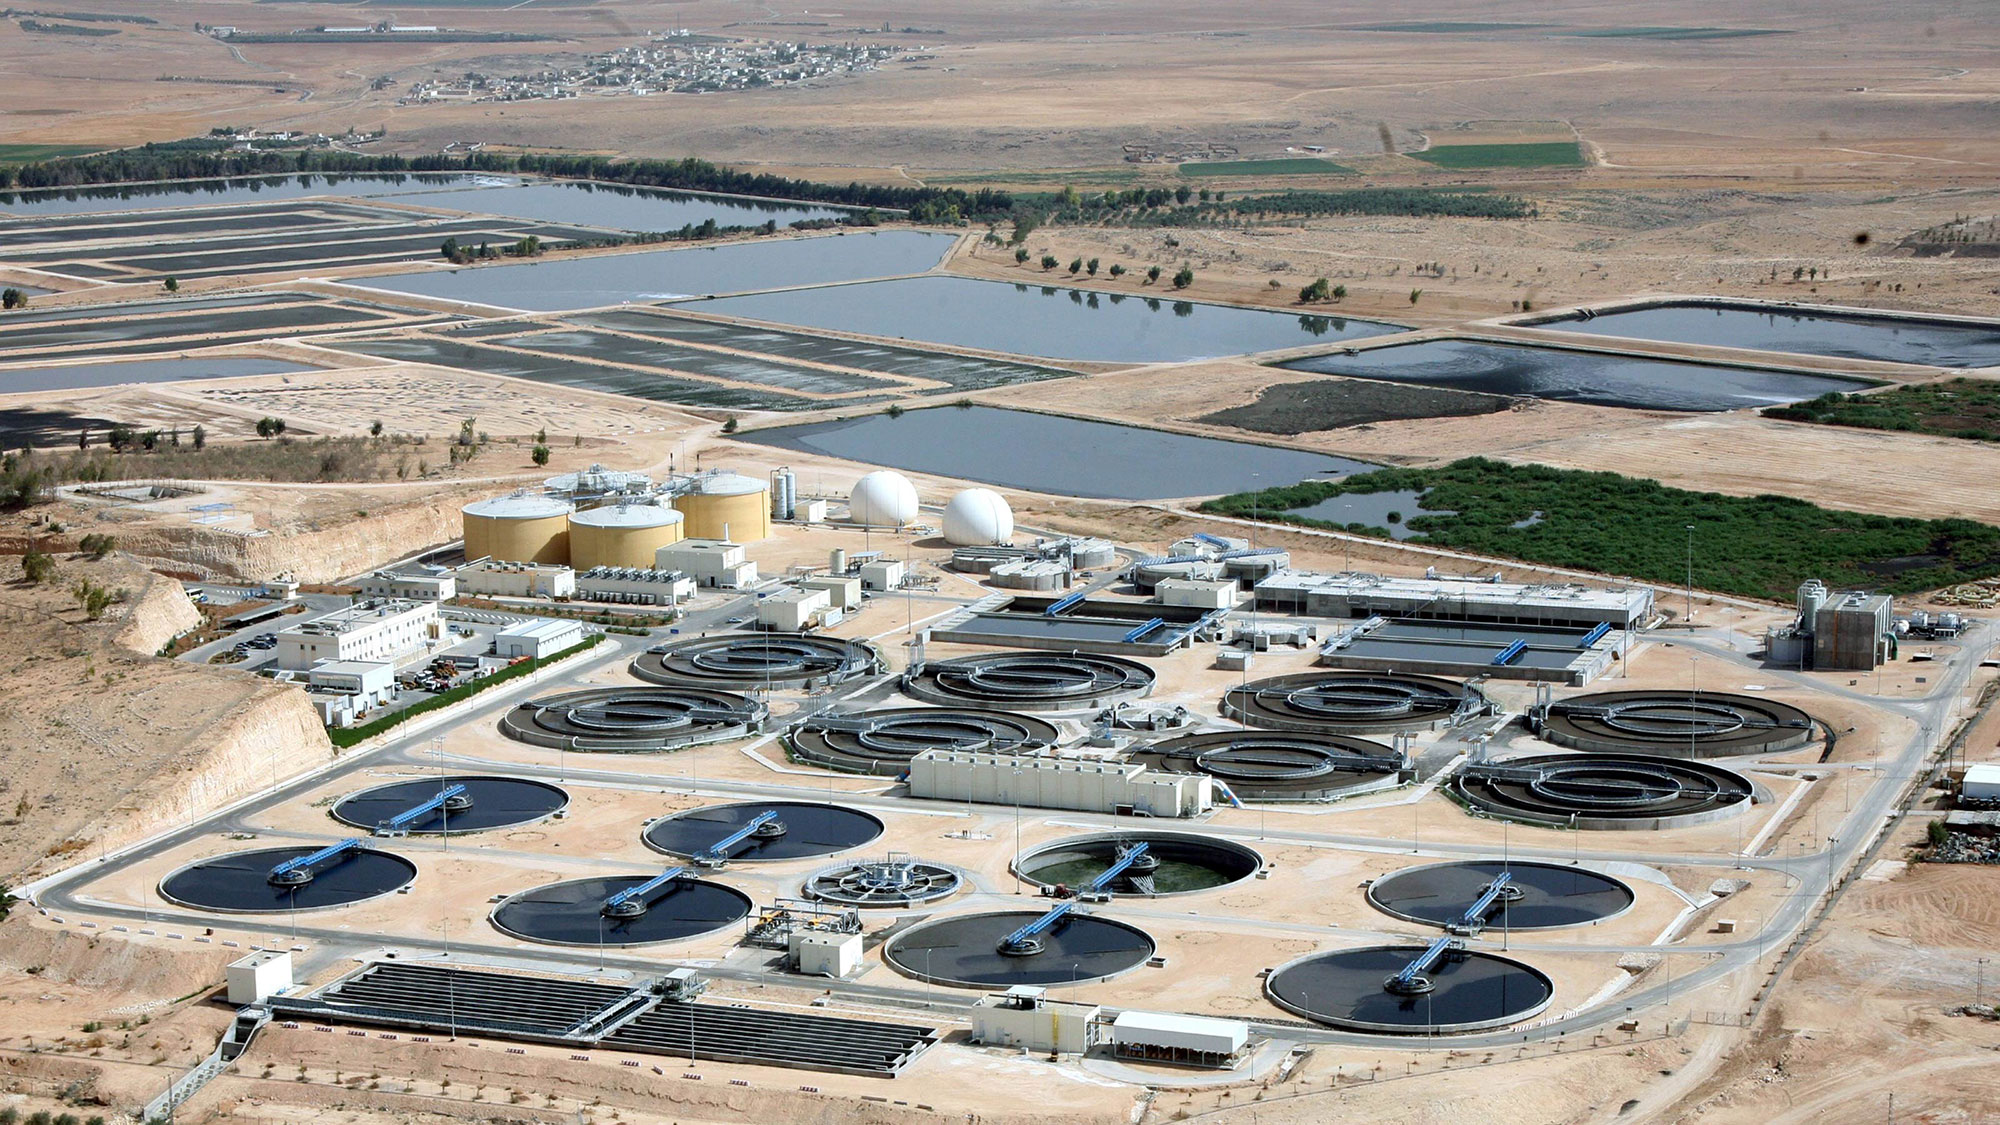 Wastewater plant AsSamra